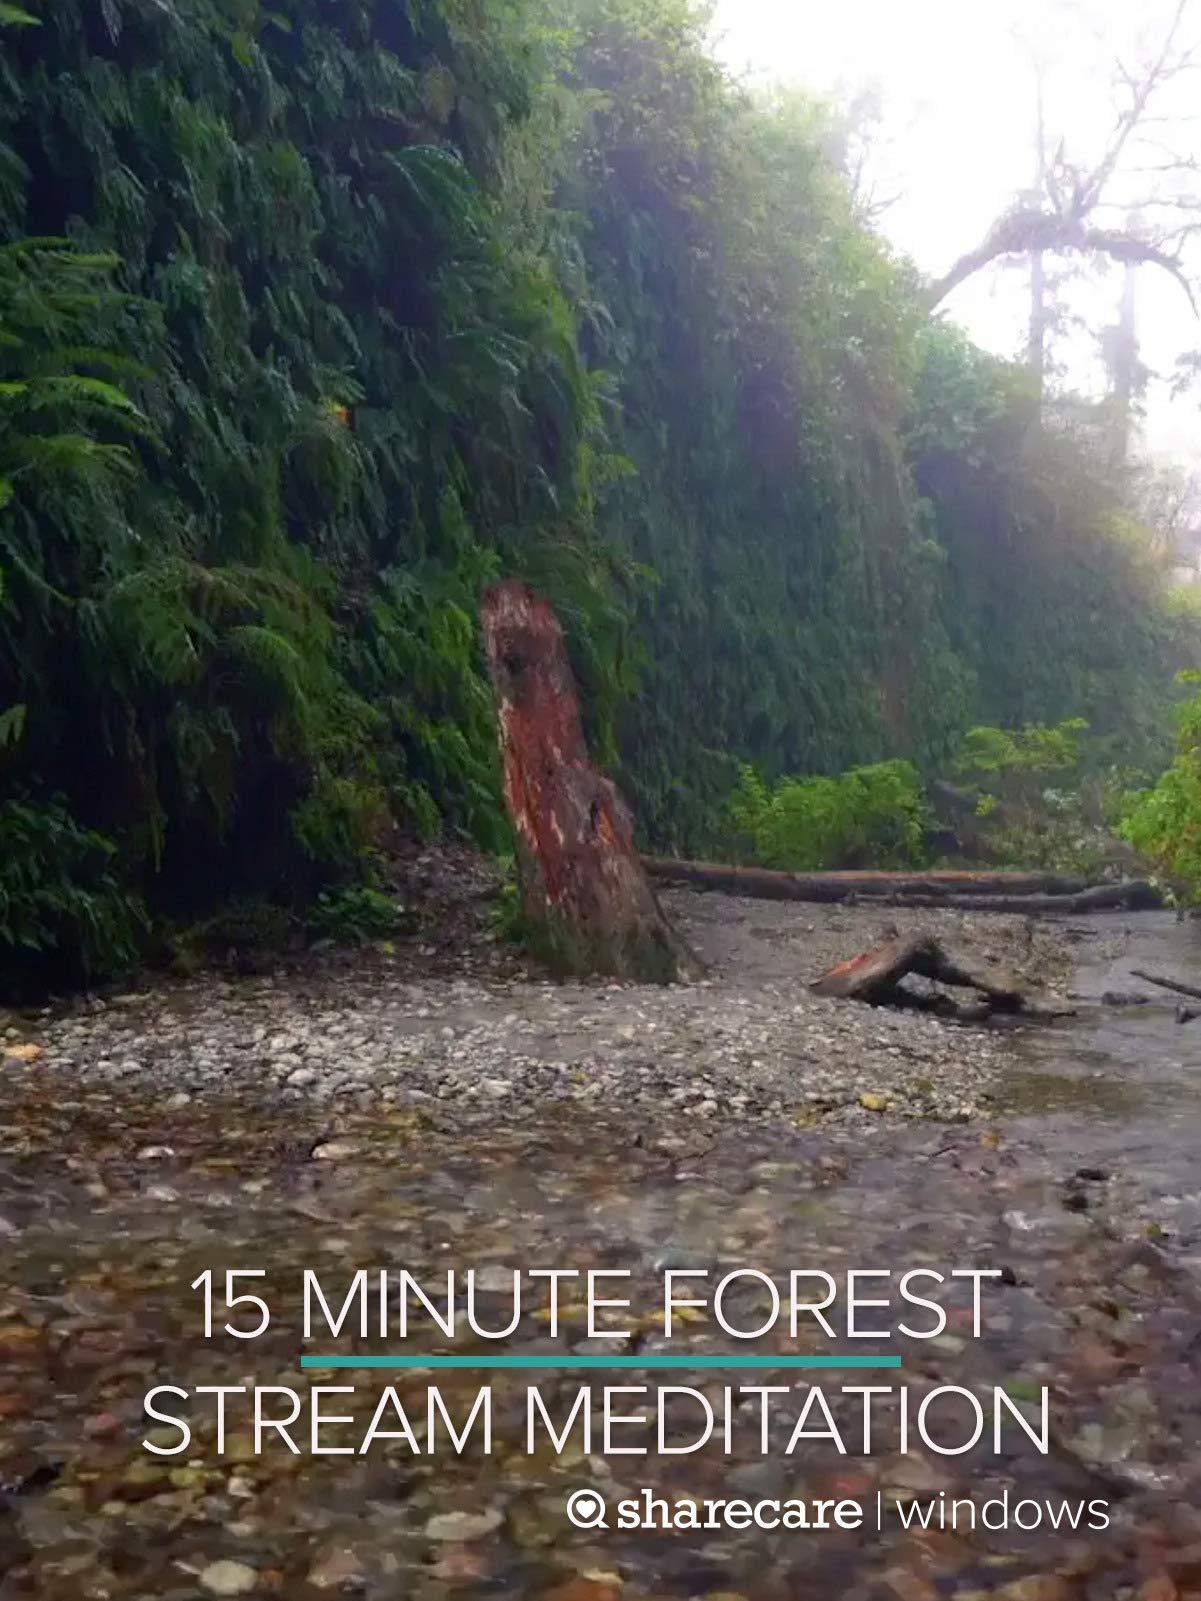 15 Minute Forest Stream Meditation